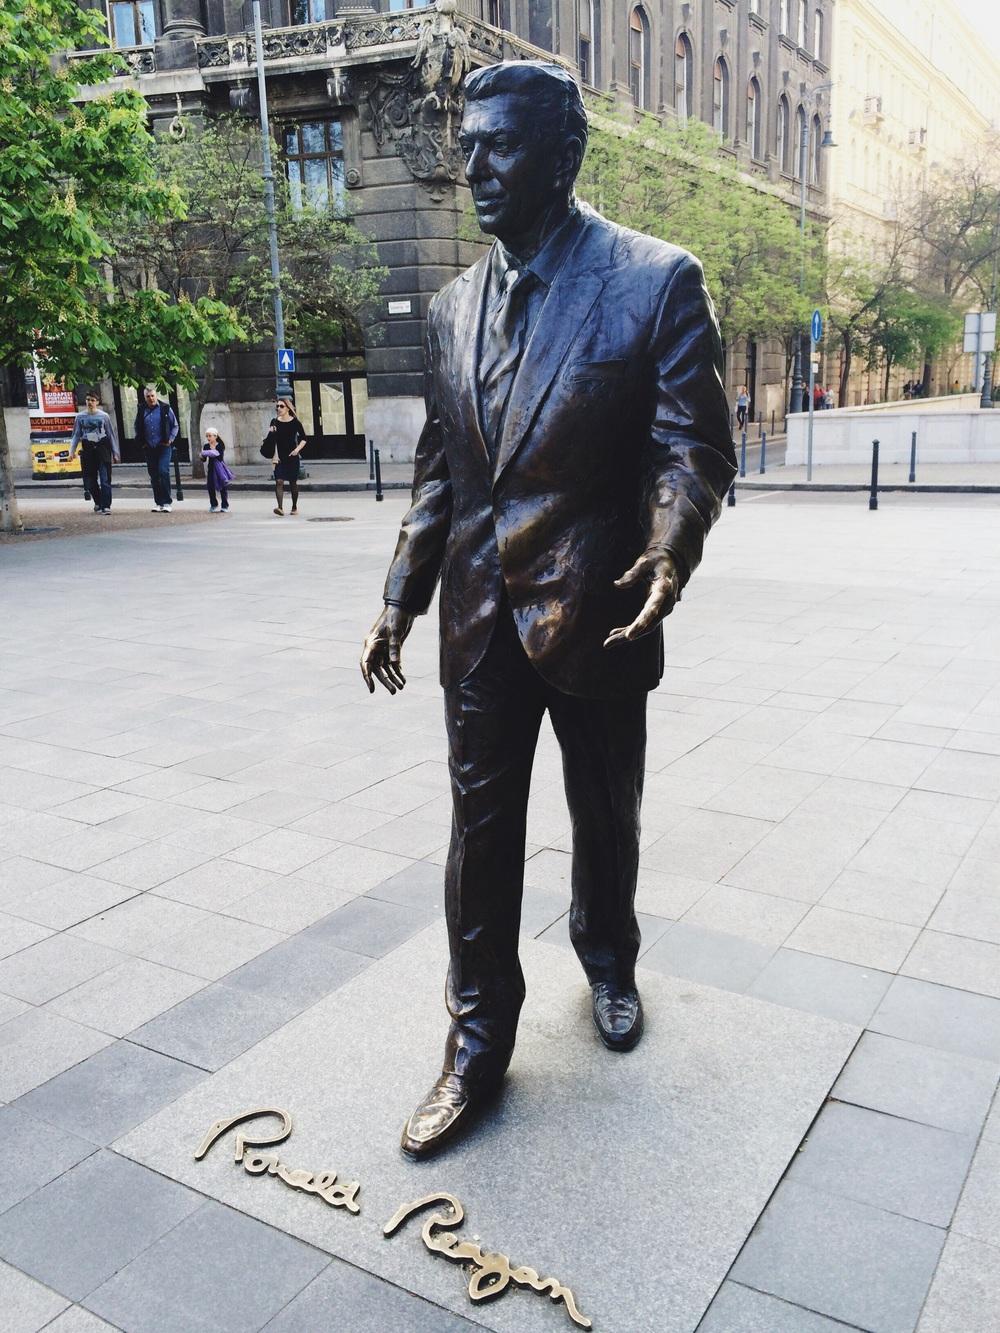 Ronald Reagan near the Soviet Monument.